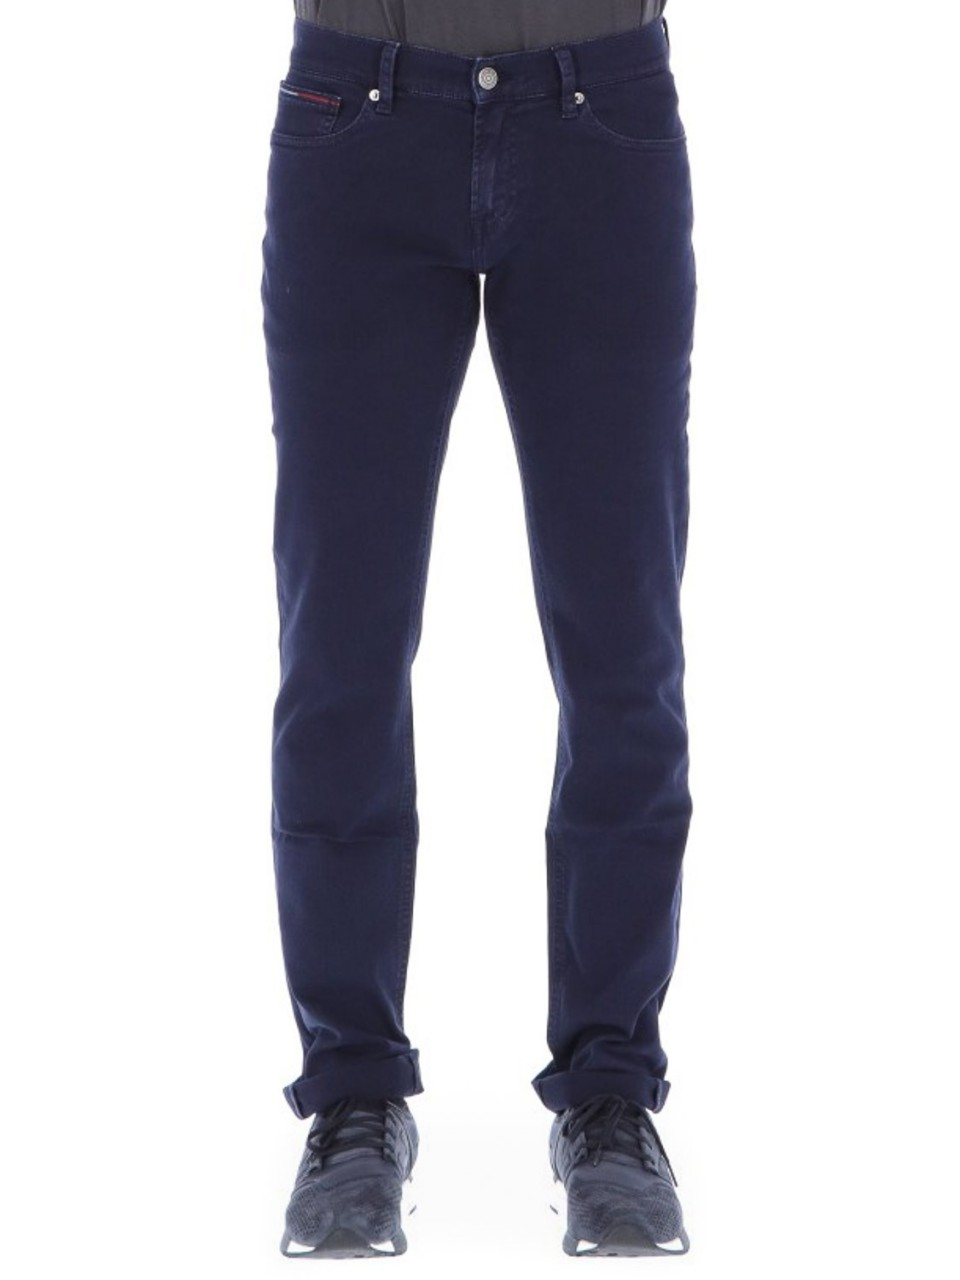 Tommy hilfiger Uomo Jeans Tommy Hilfiger Uomo 05290I